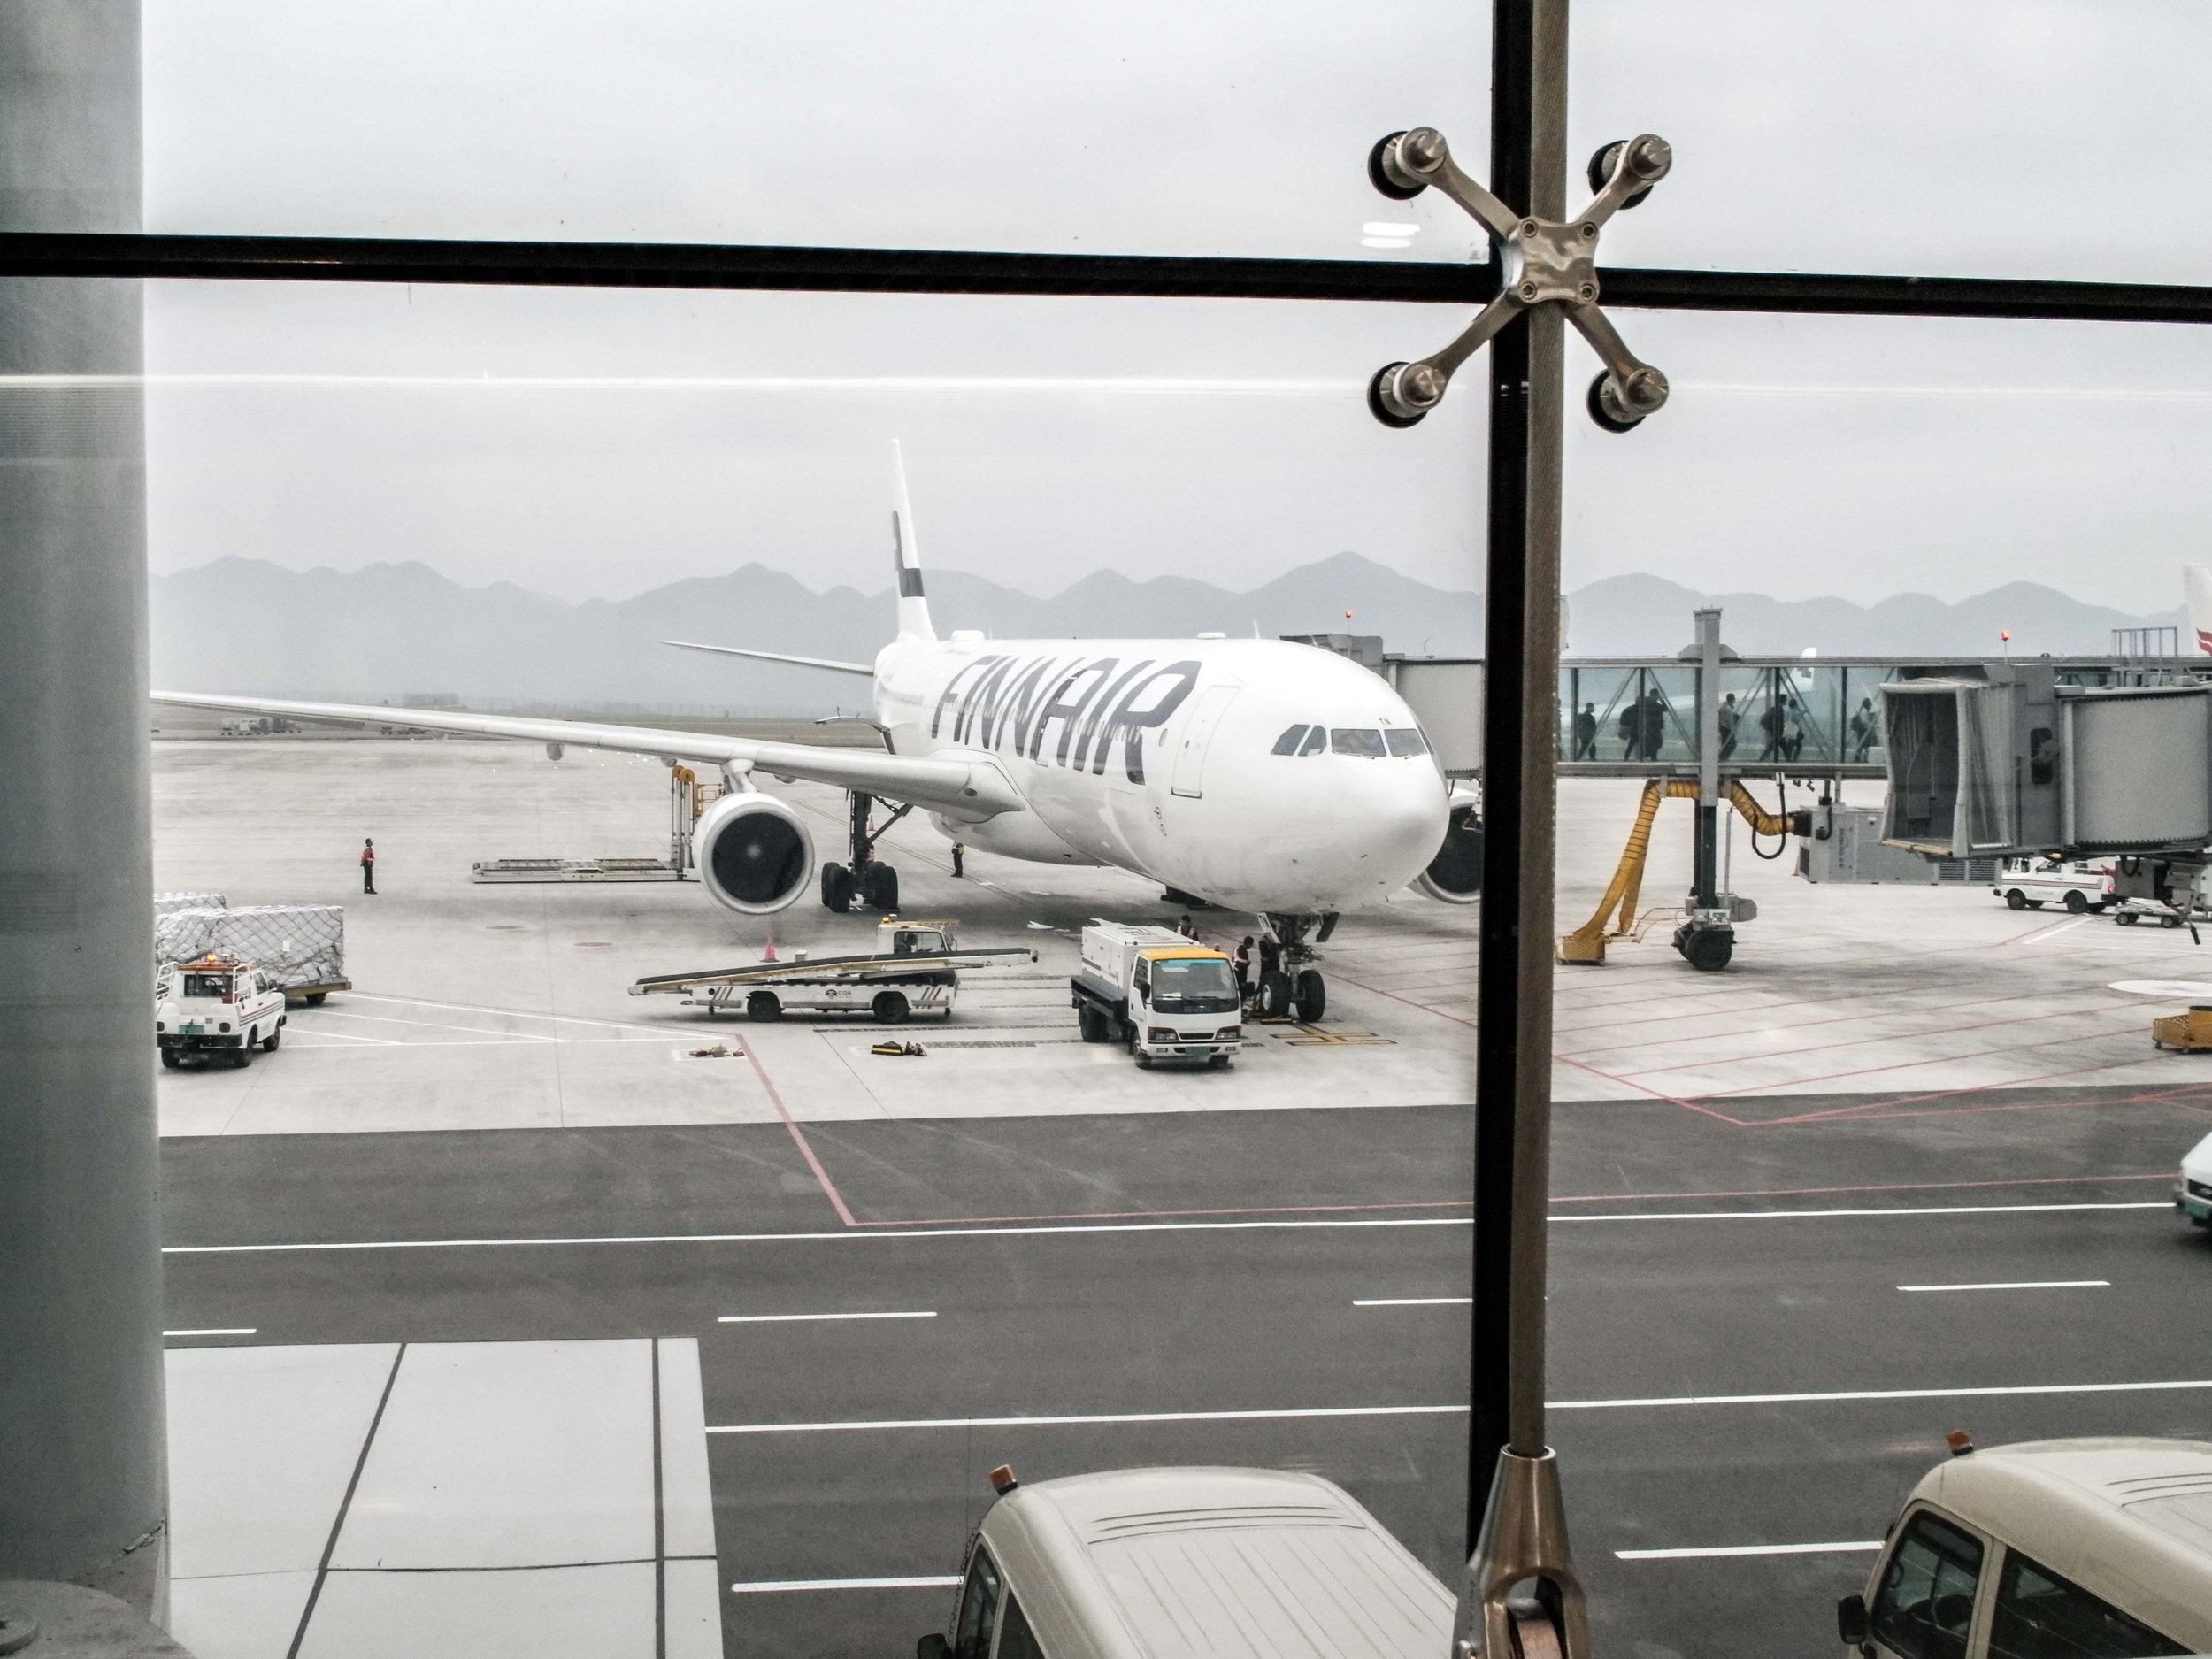 Chongqing airport